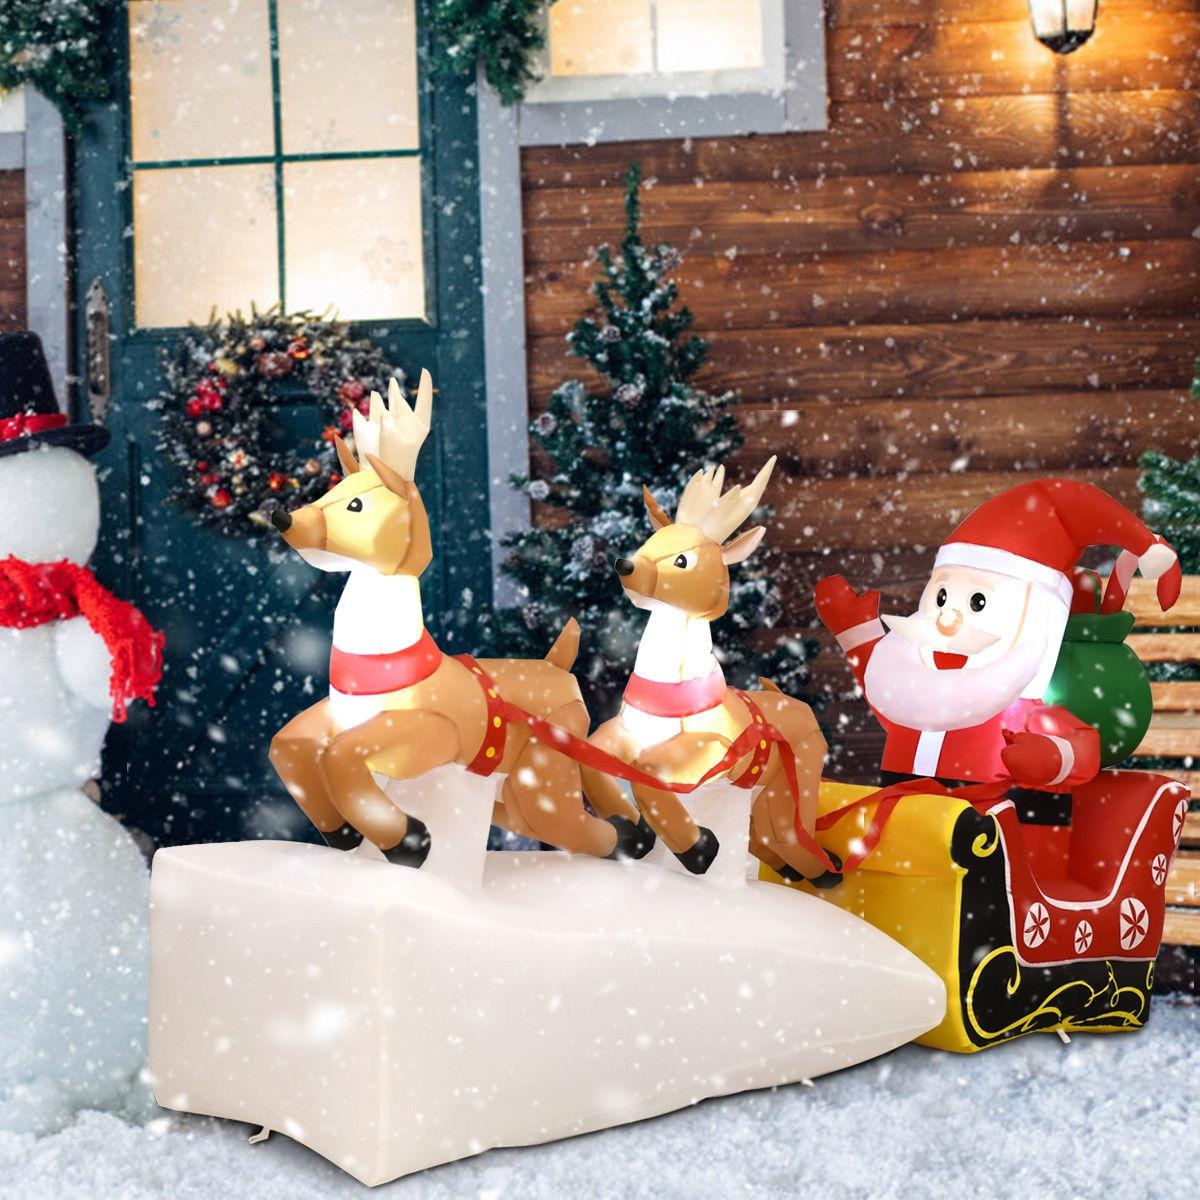 7' Outdoor Christmas Inflatable Santa Claus on Sleigh 2 Reindeers